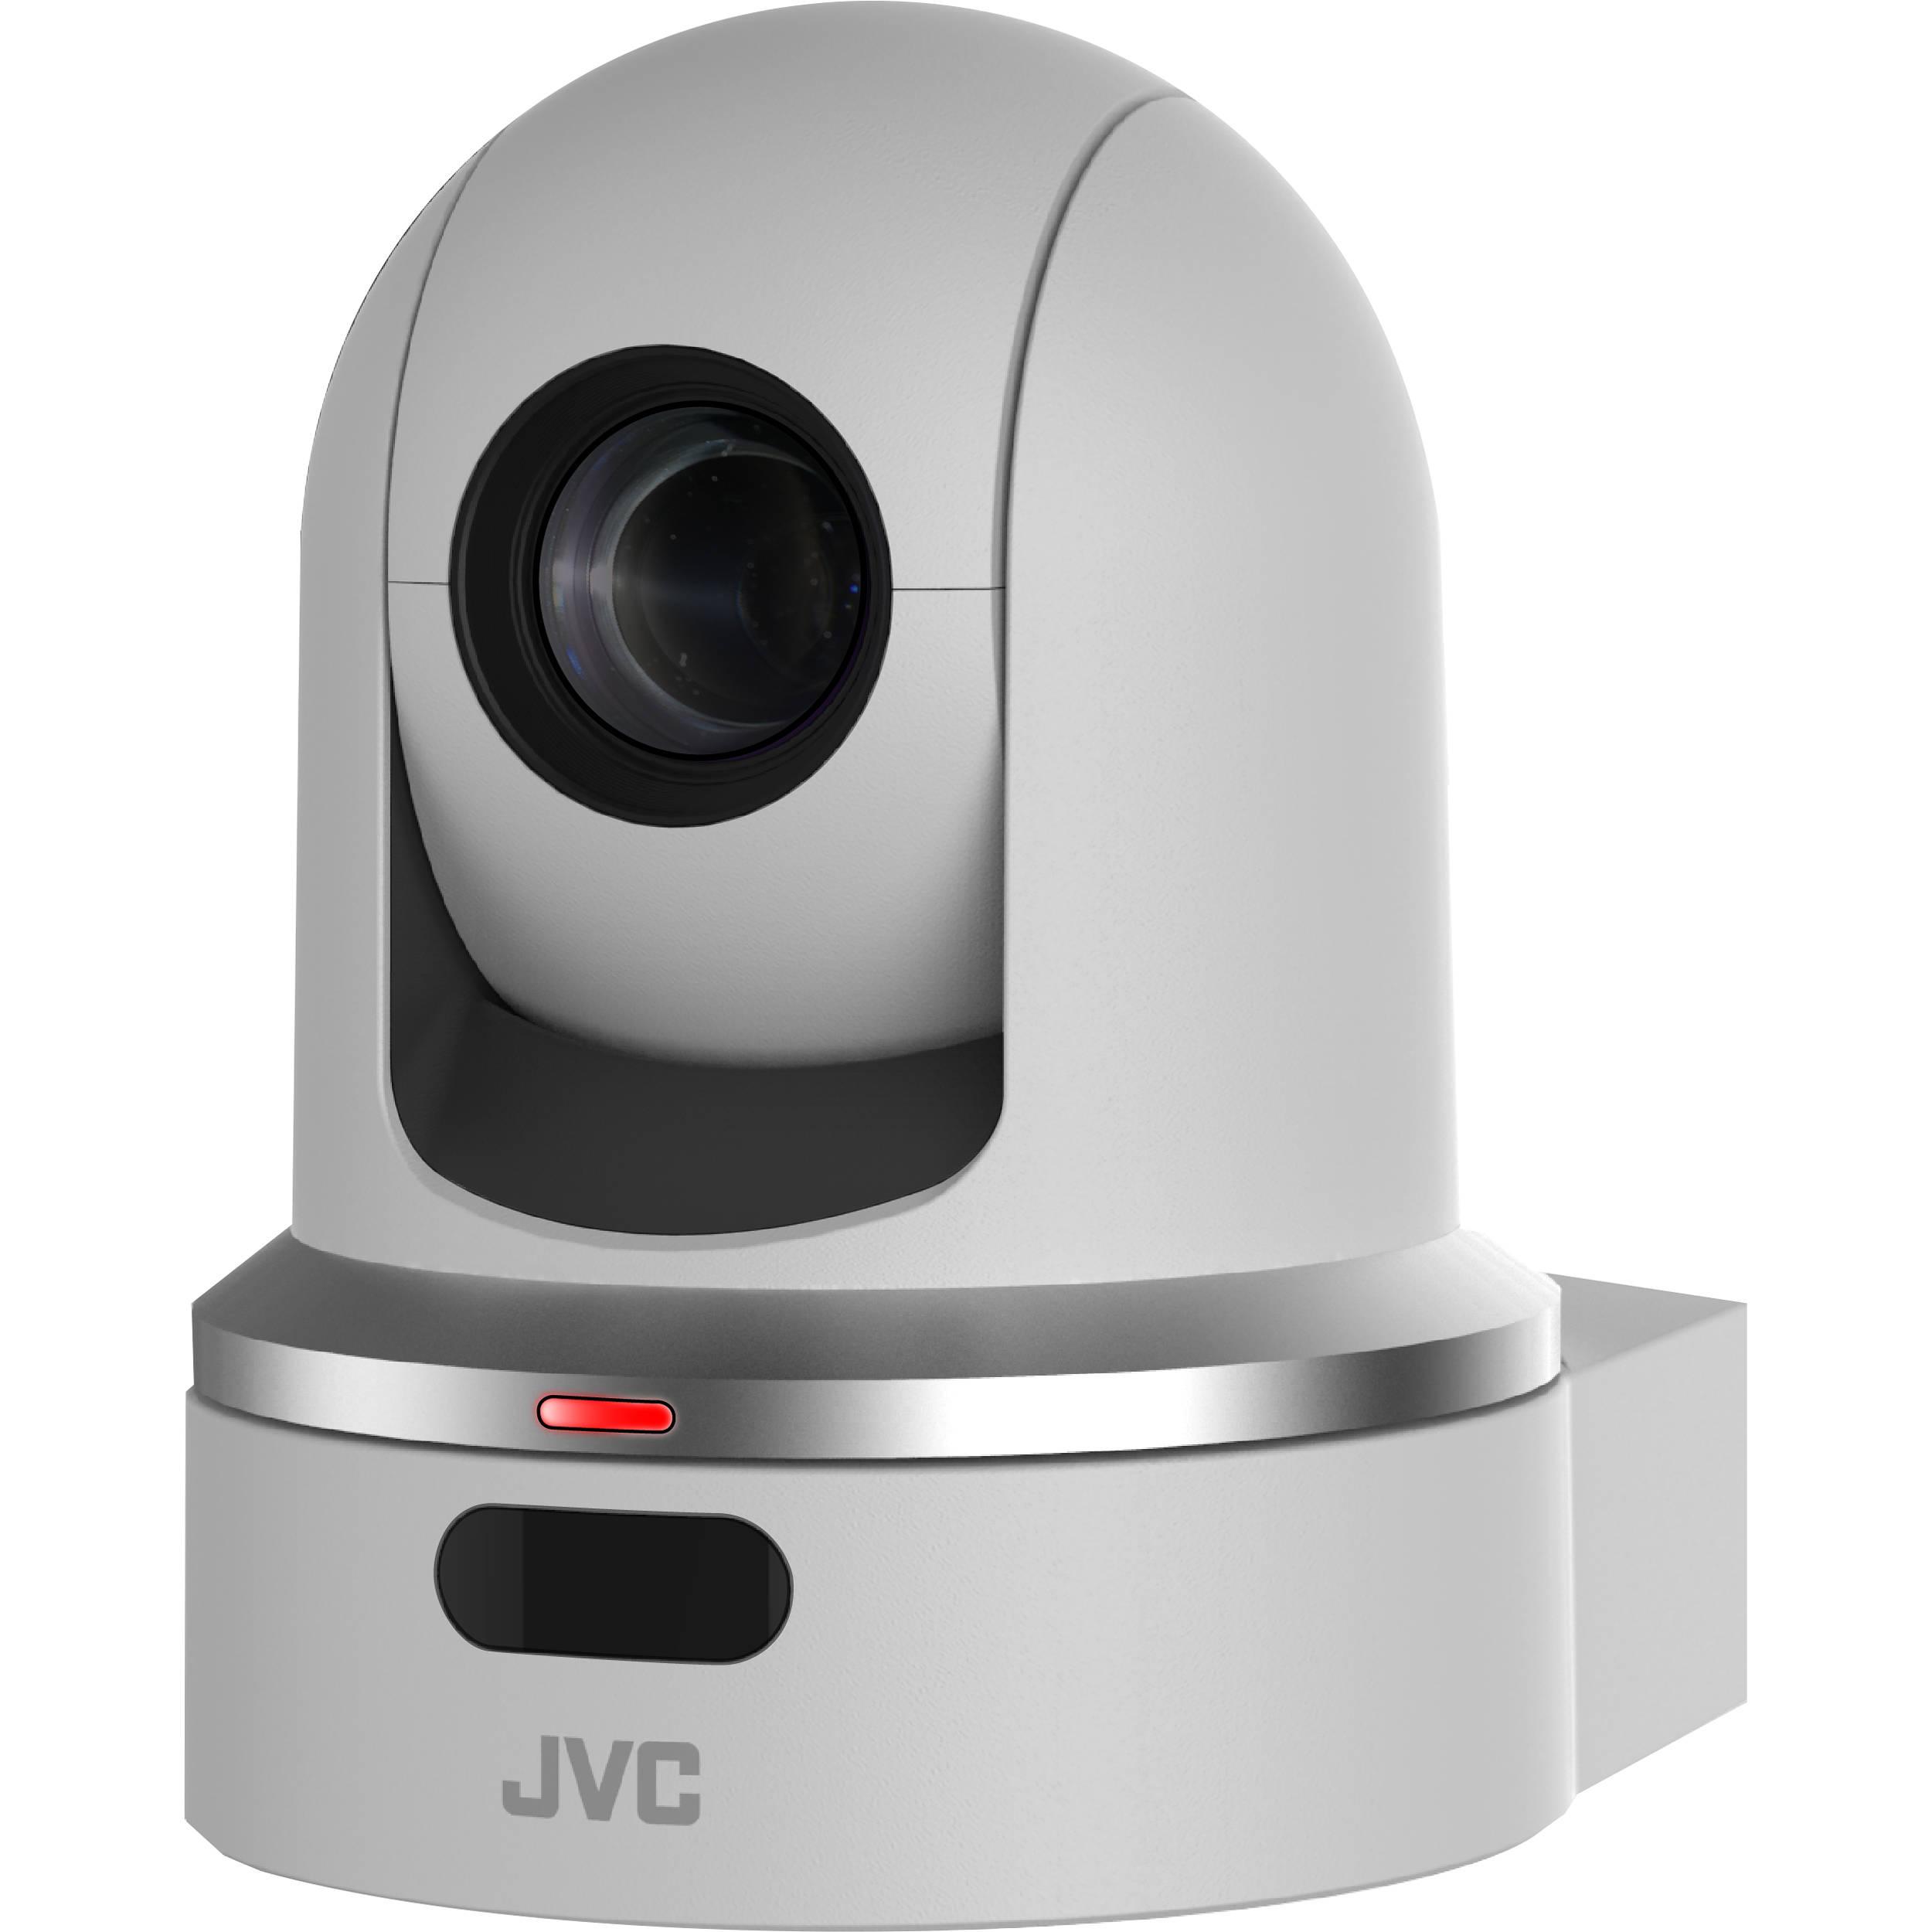 JVC WEB CAMERA WINDOWS VISTA DRIVER DOWNLOAD